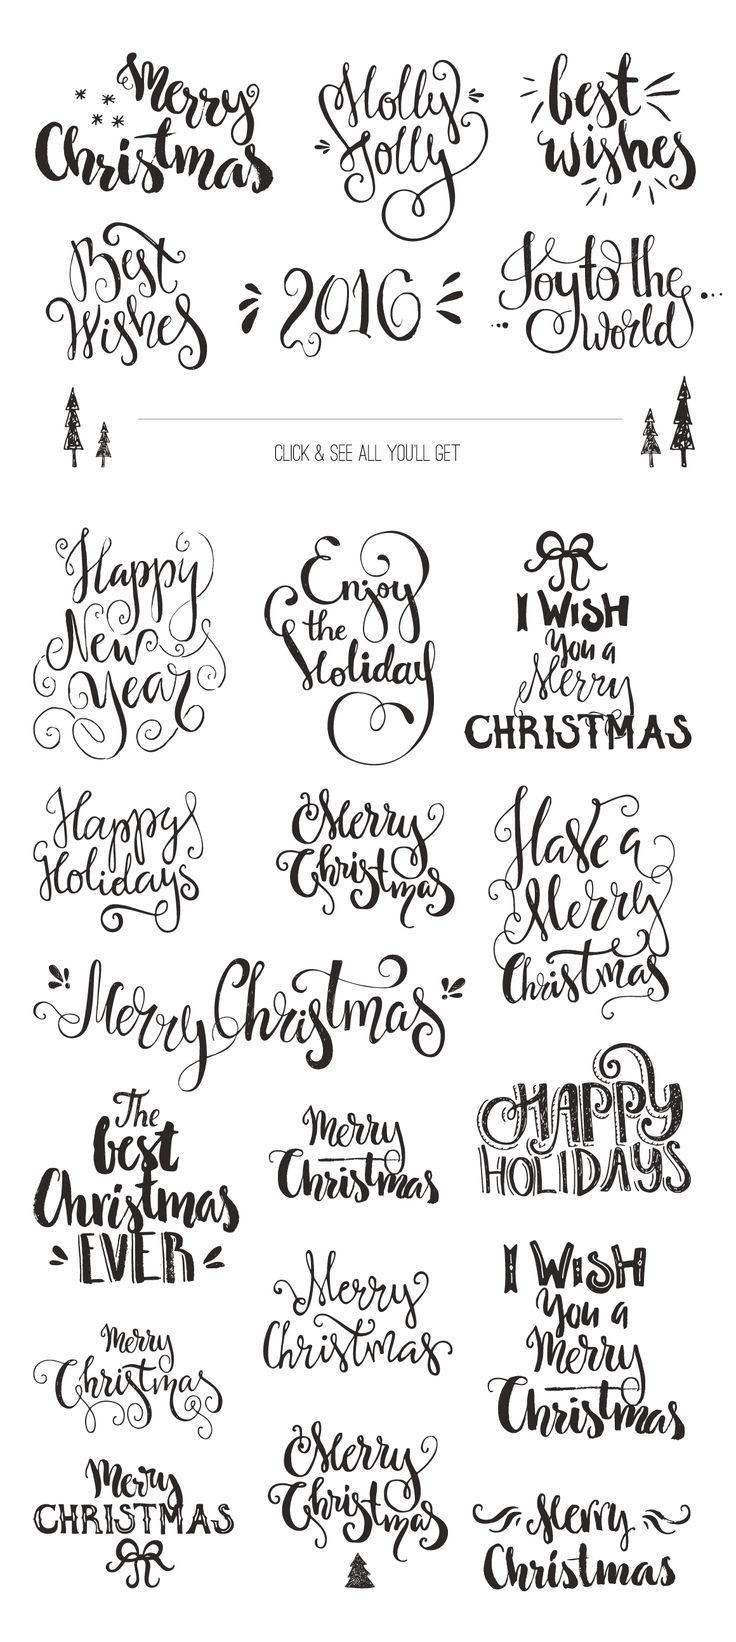 Handdrawn Christmas Photo Overlays by Favete Art on Creative Market – Temmax Wanchaluem